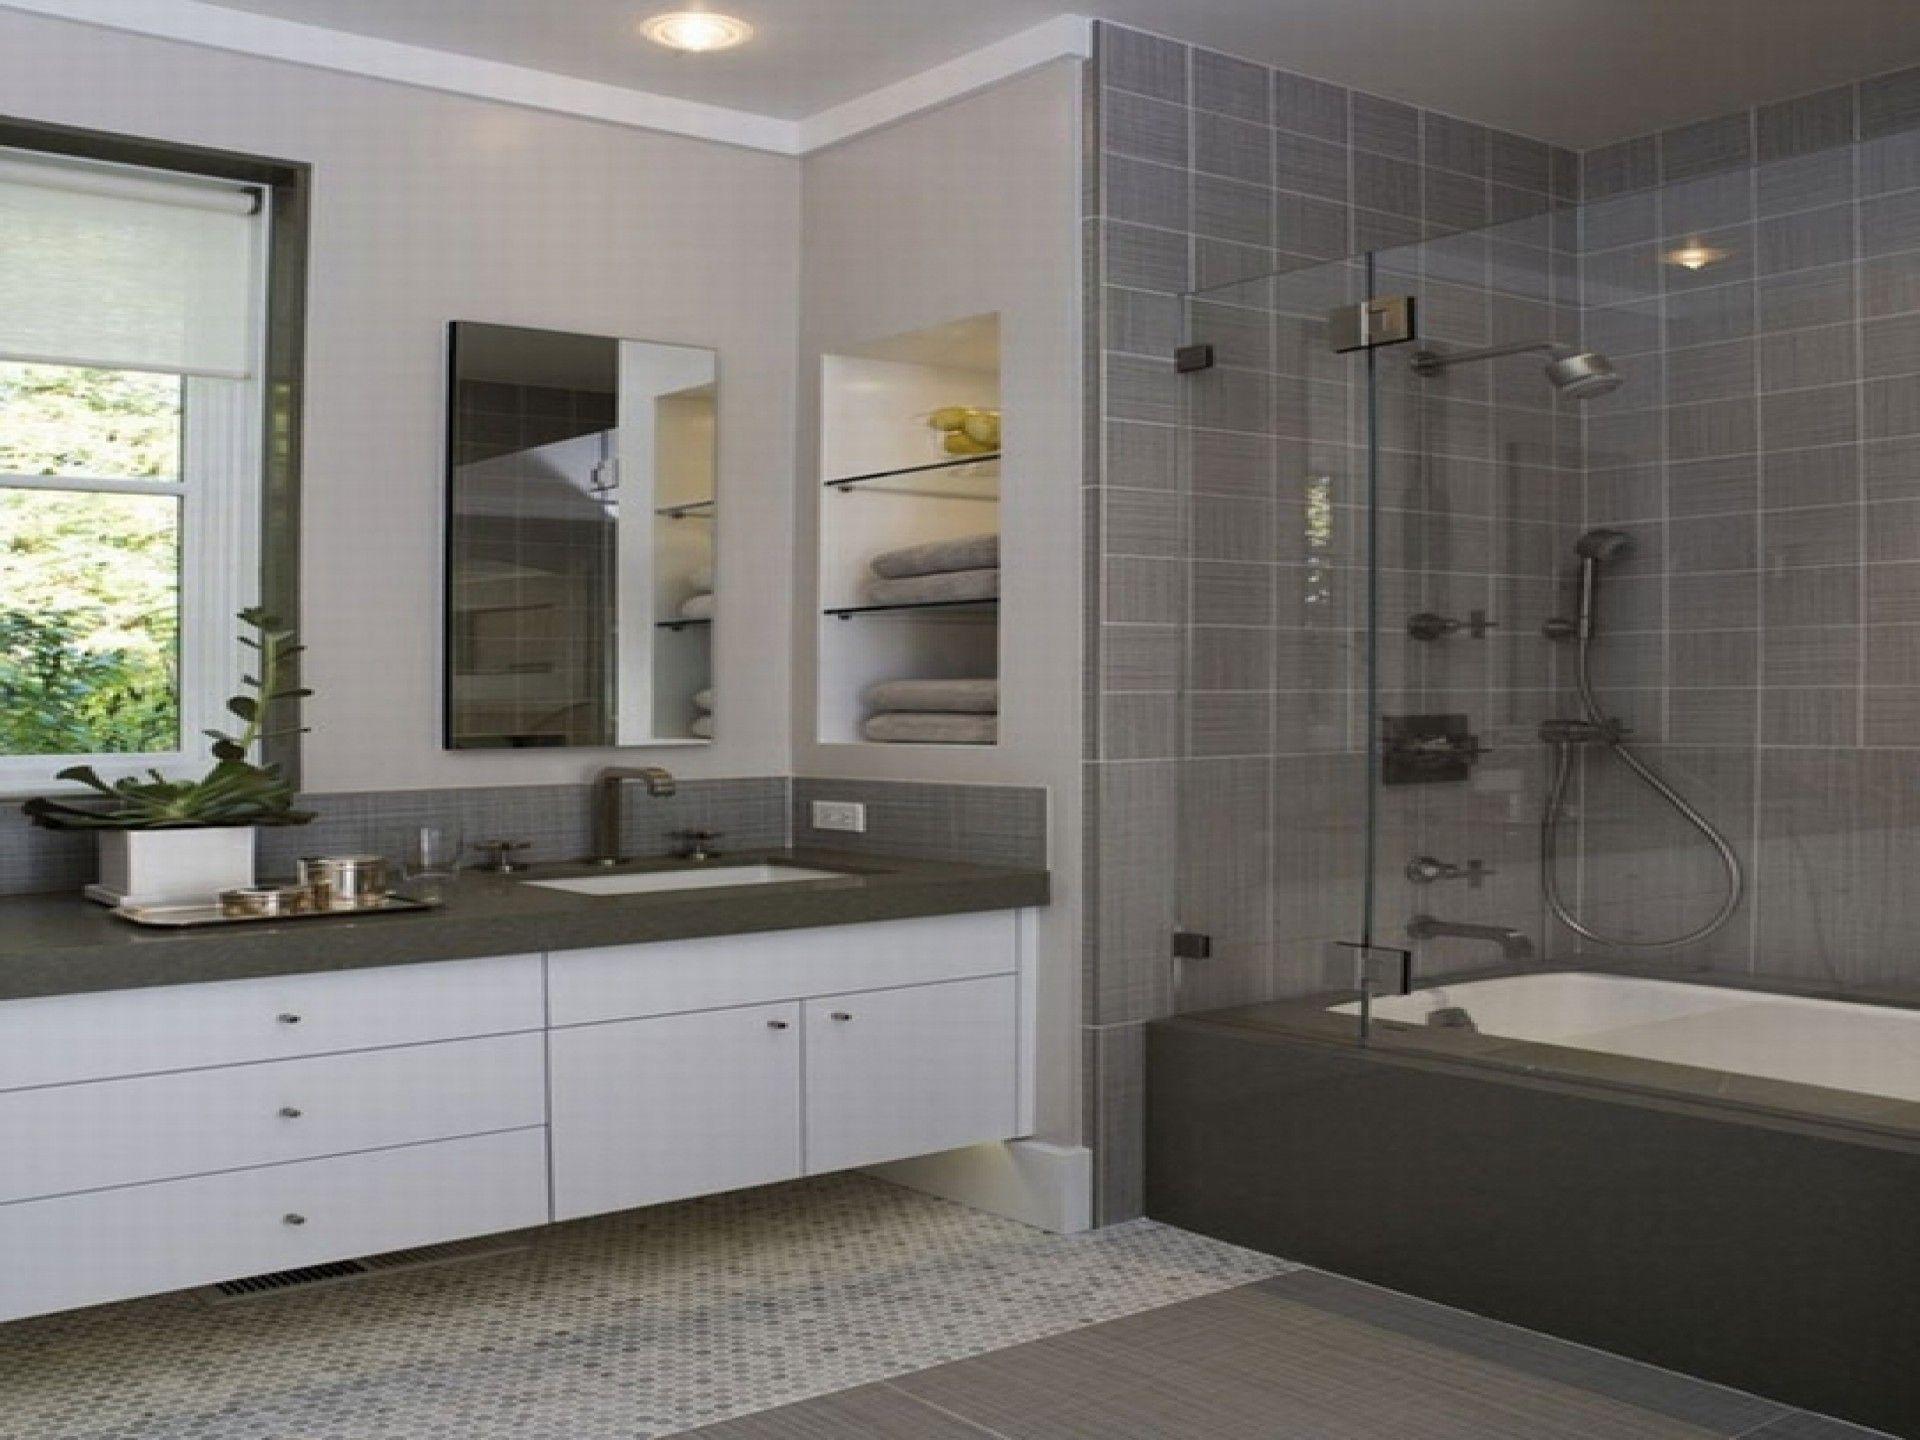 SmallbathroomcolorideasonabudgetcabinStaircaseStyleMedium - Small bathroom color ideas on a budget